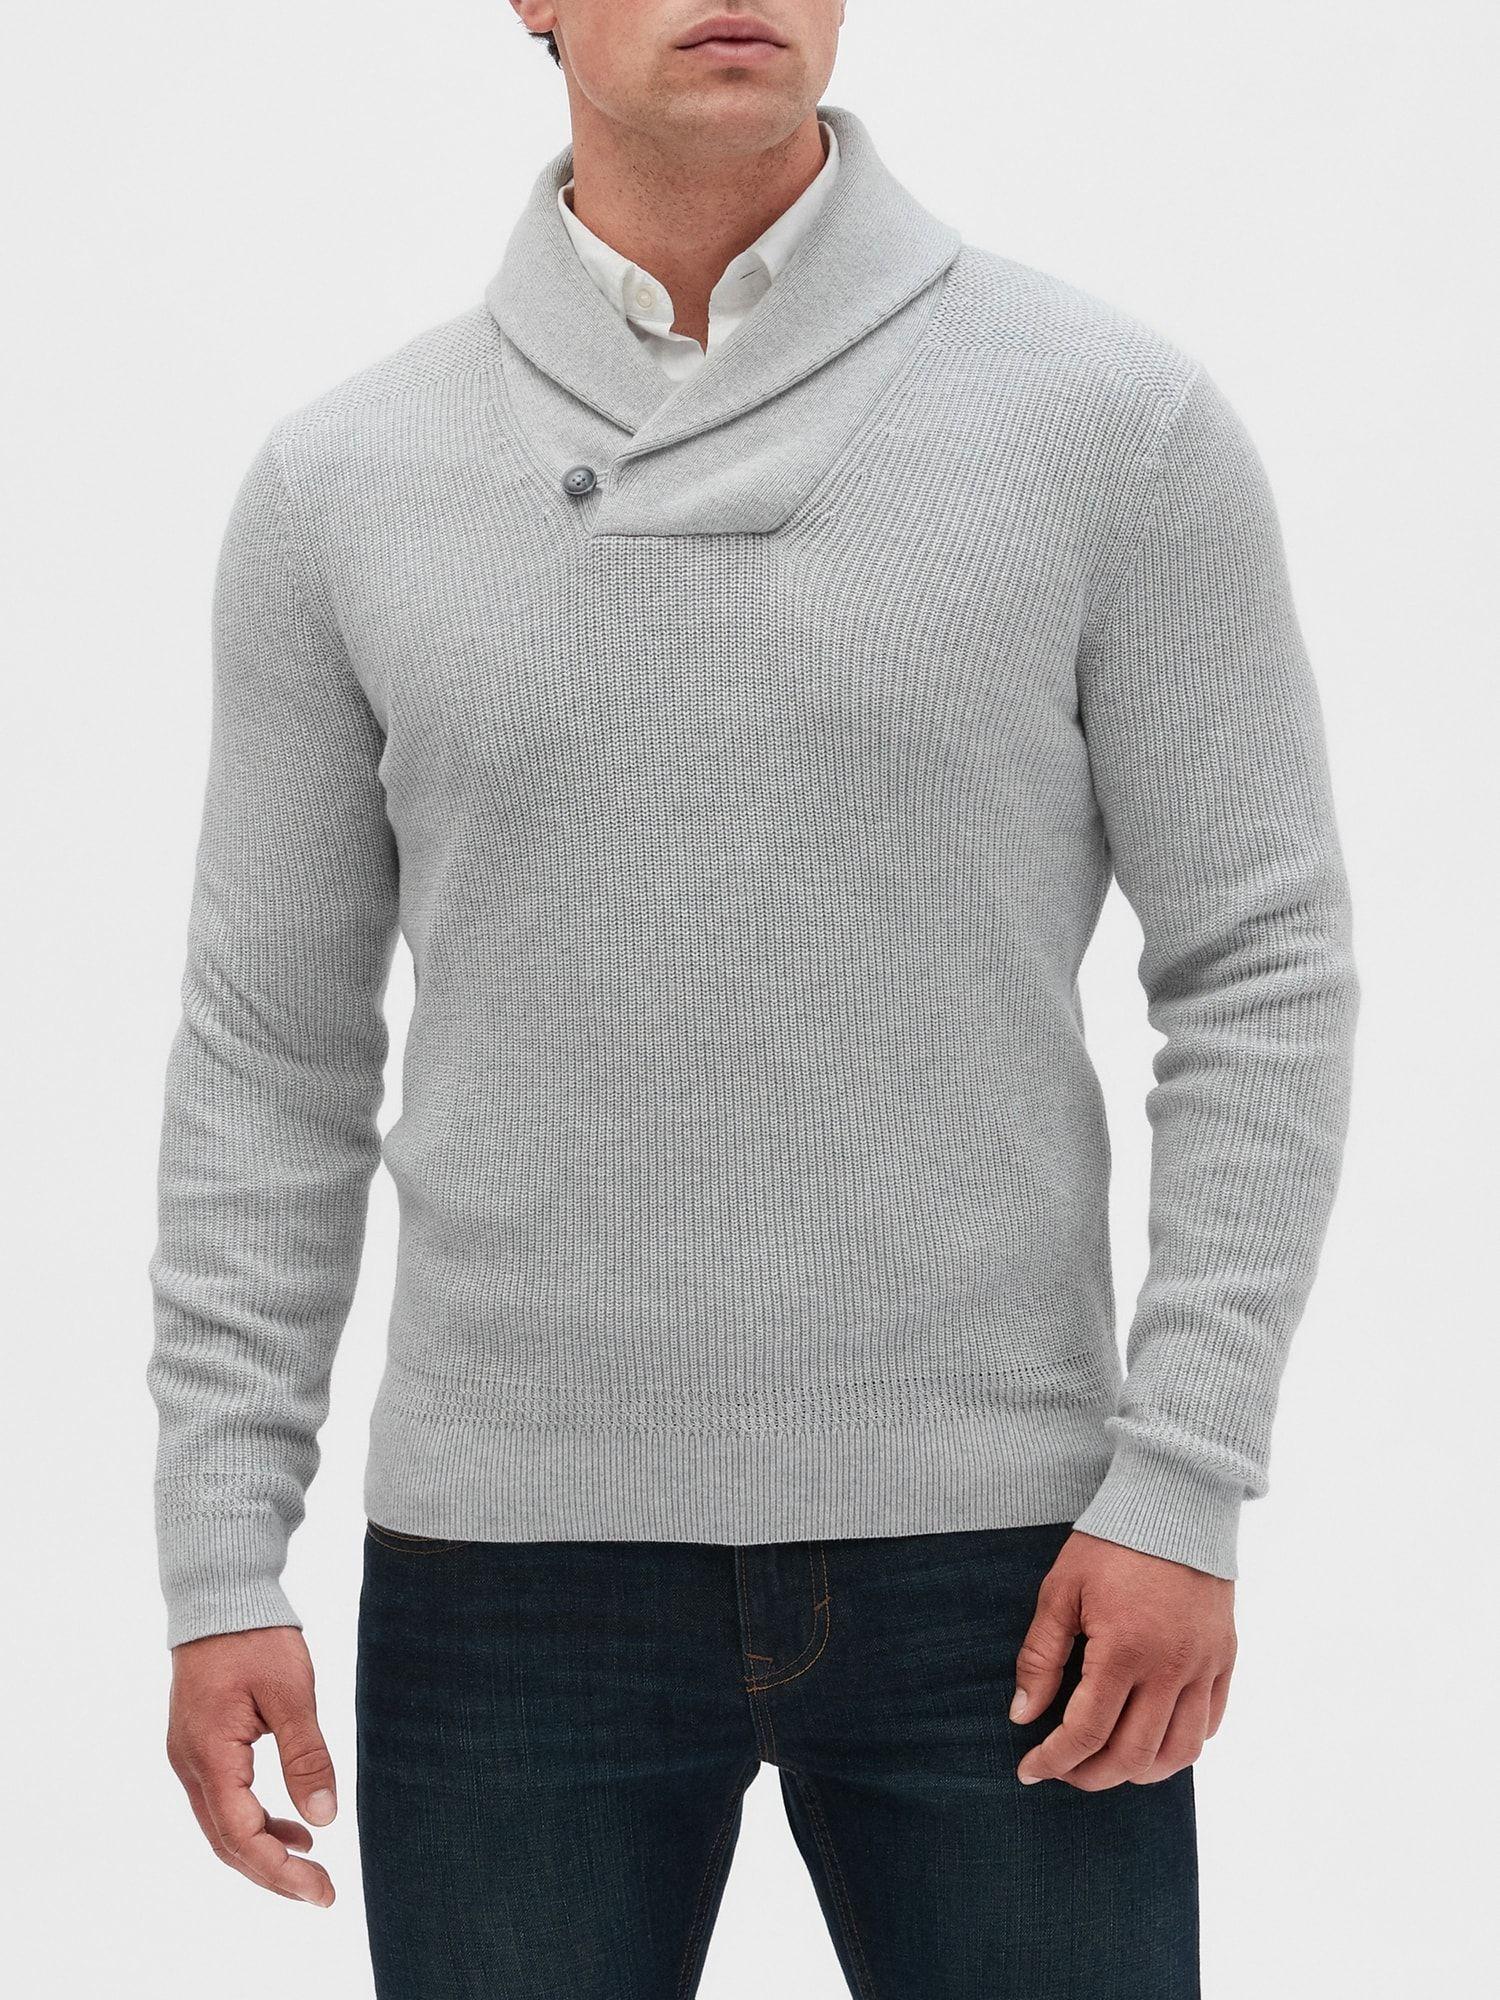 Pin By Joshua Colliflower On Men S Sweaters In 2020 Men Sweater Pullover Sweaters Sweaters [ 2000 x 1500 Pixel ]